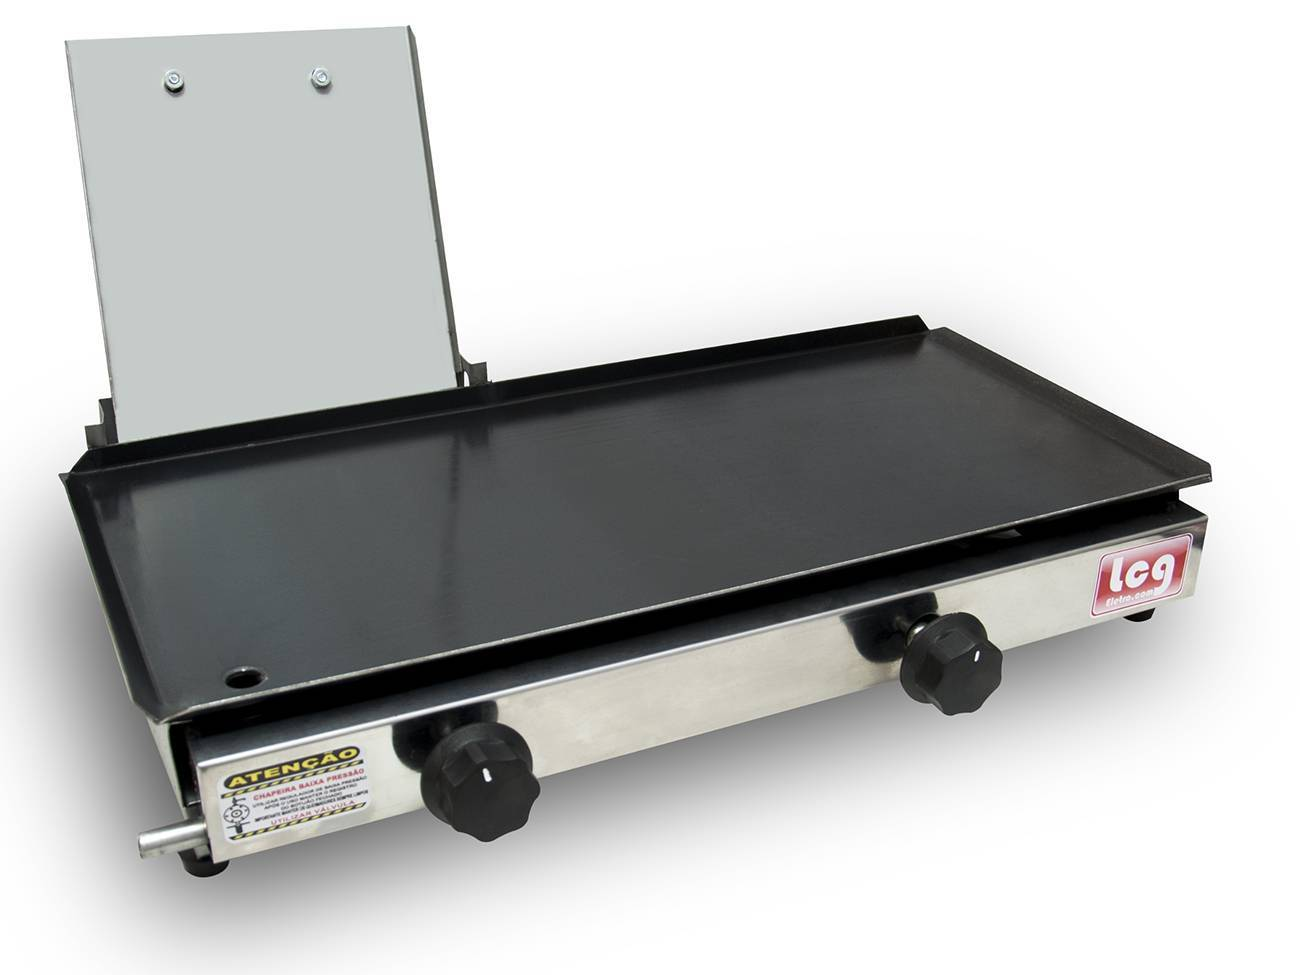 Chapa Para Lanche A Gás Sanduicheira 30x60cm Lcg + Kit Gás - LCGELETRO